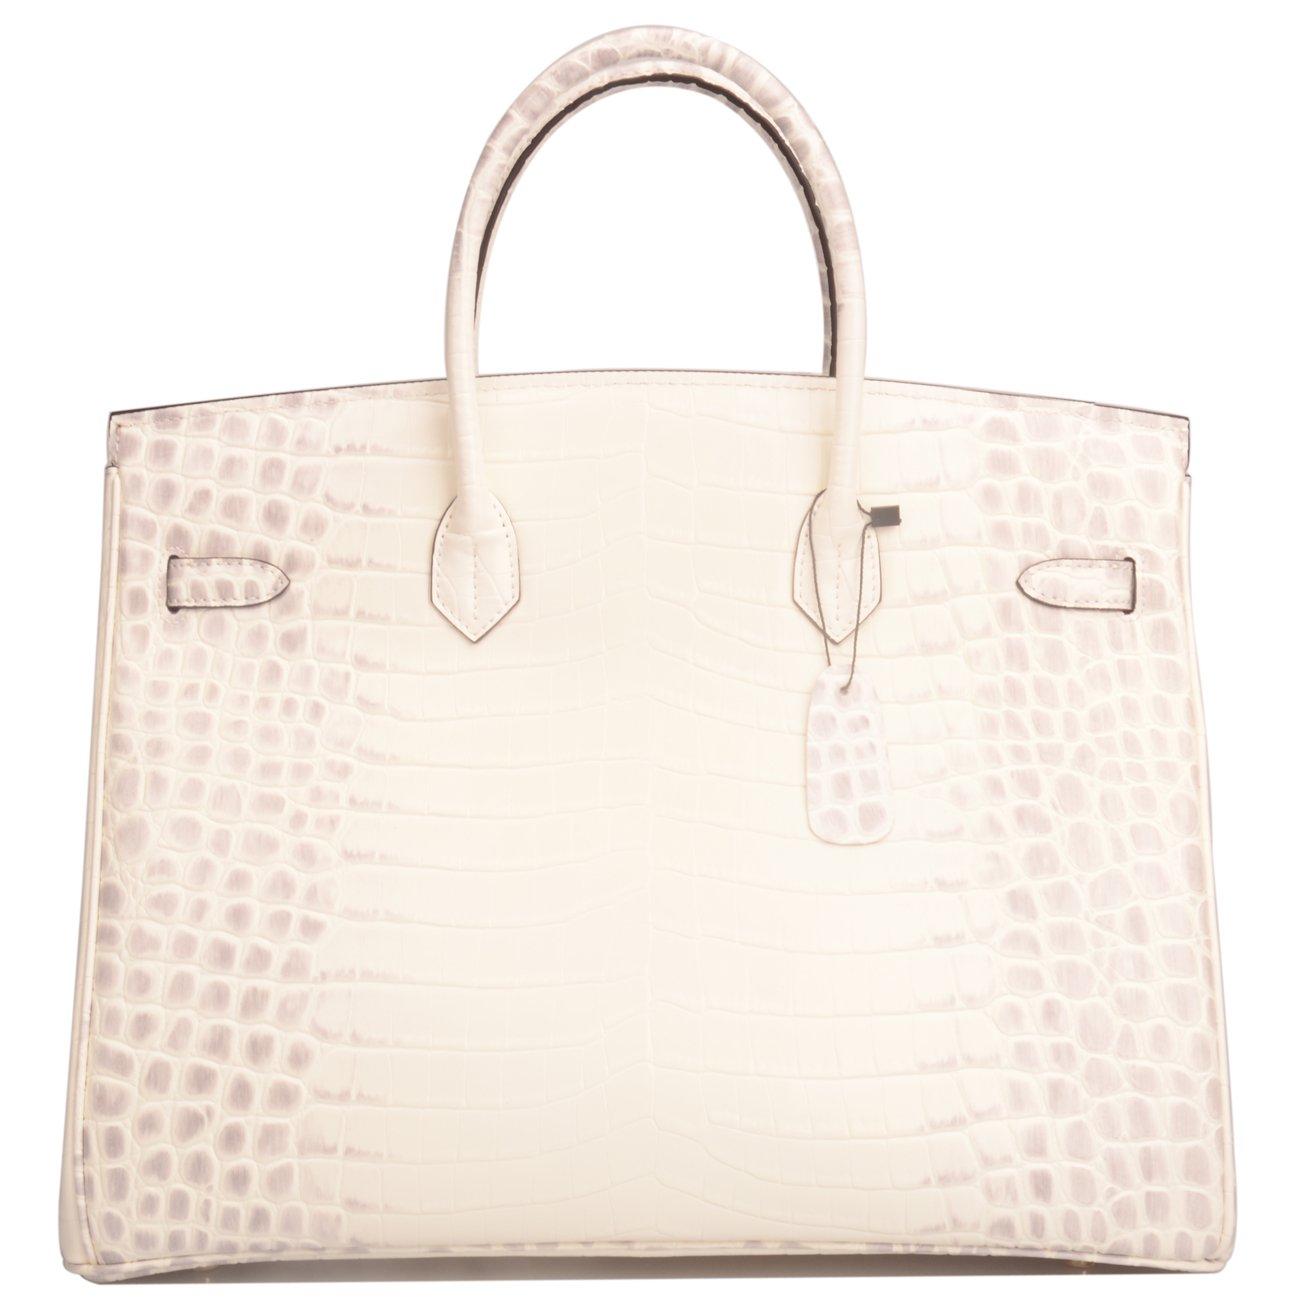 Ainifeel 40cm Oversized Patent Leather Padlock Handbag Business Purse (40cm OVERSIZE, Himalayan) by Ainifeel (Image #4)